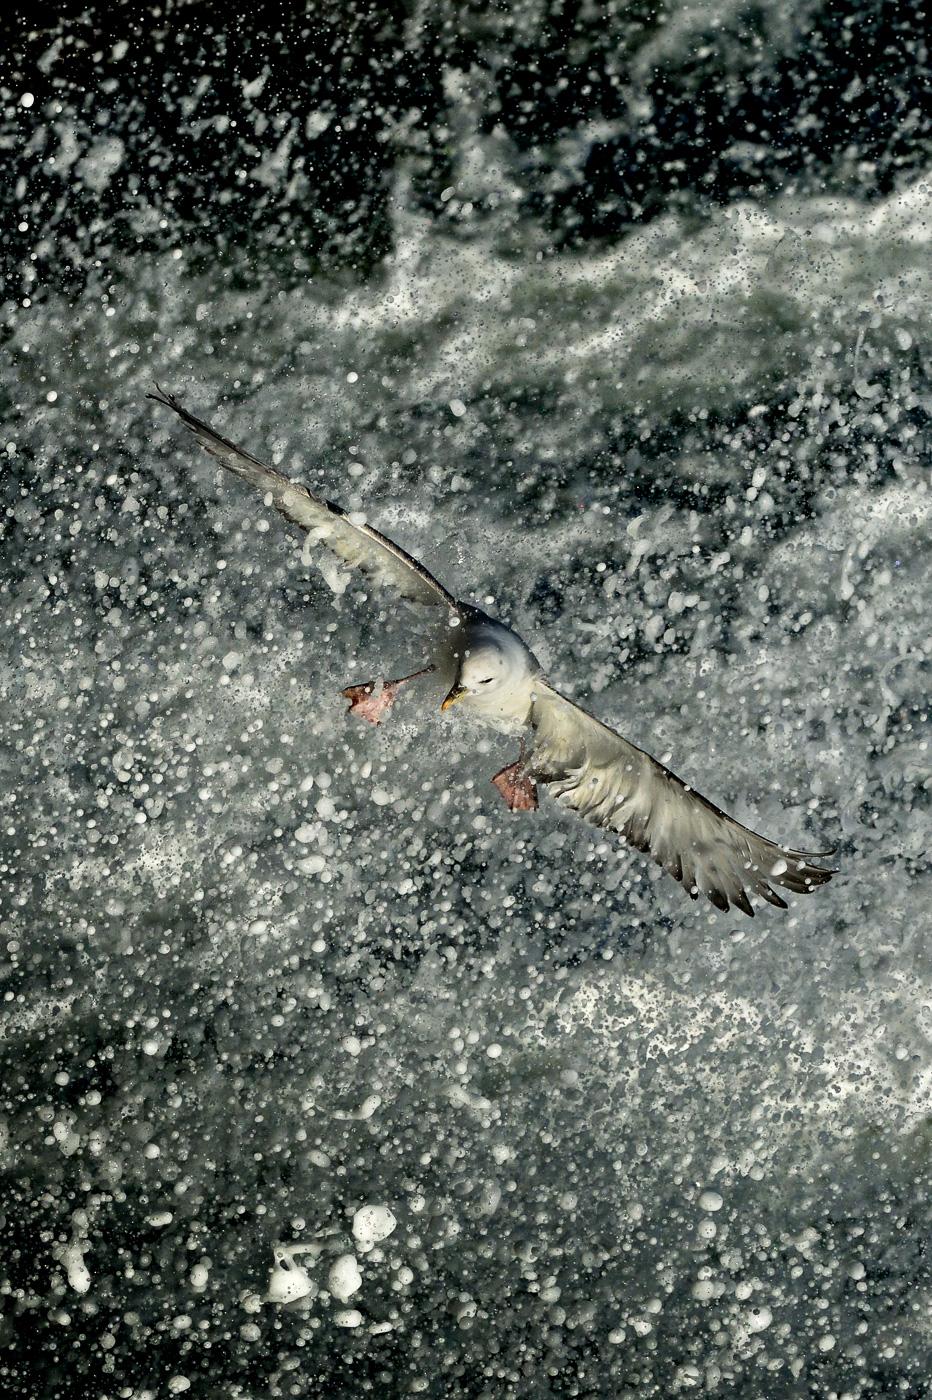 fulmer fighting against waves ireland